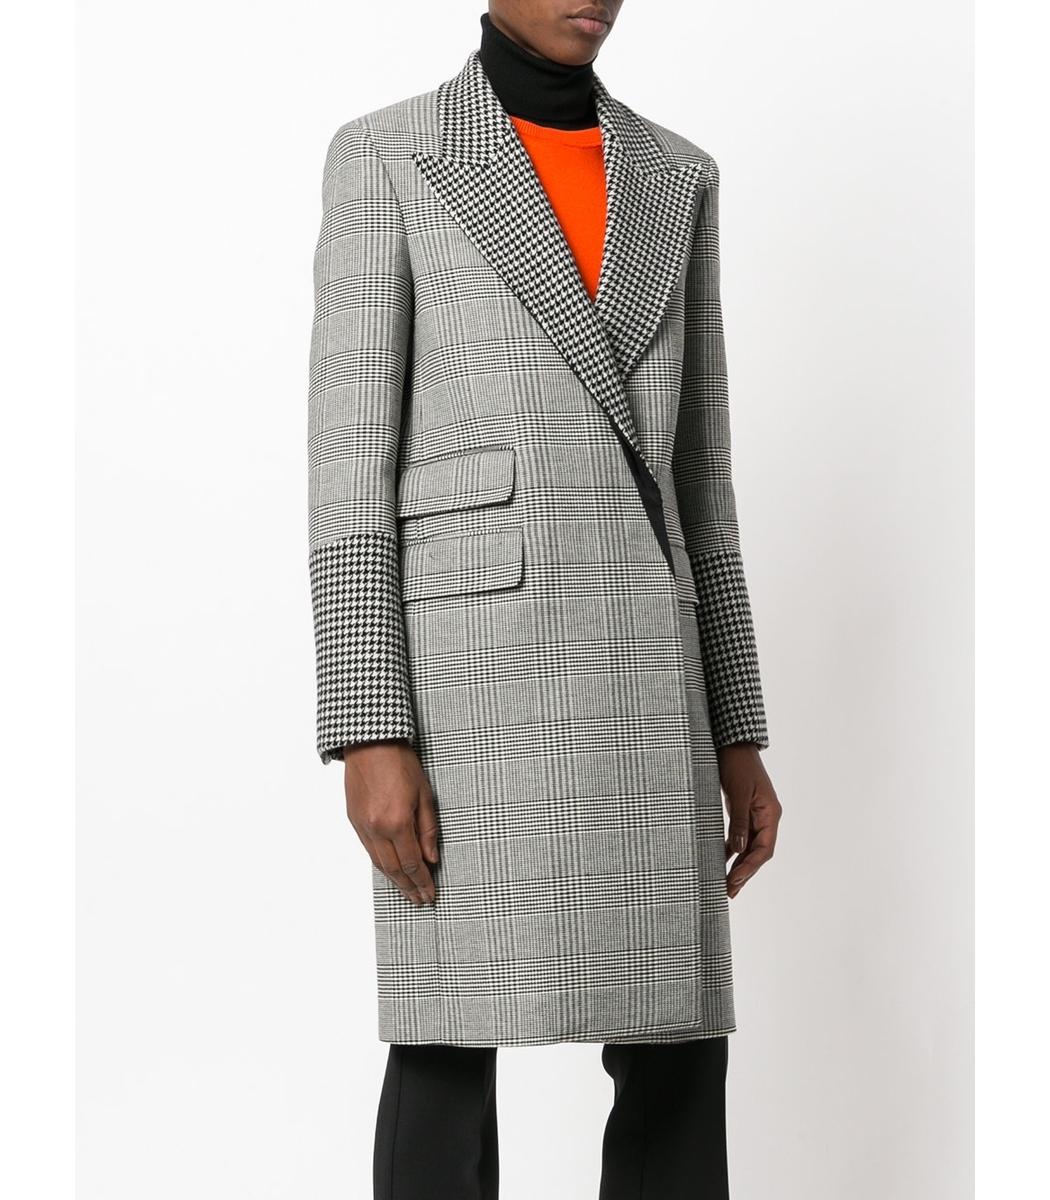 Stella McCartney Houndstooth Coat - Black/White Wool Blend Peacoat ...